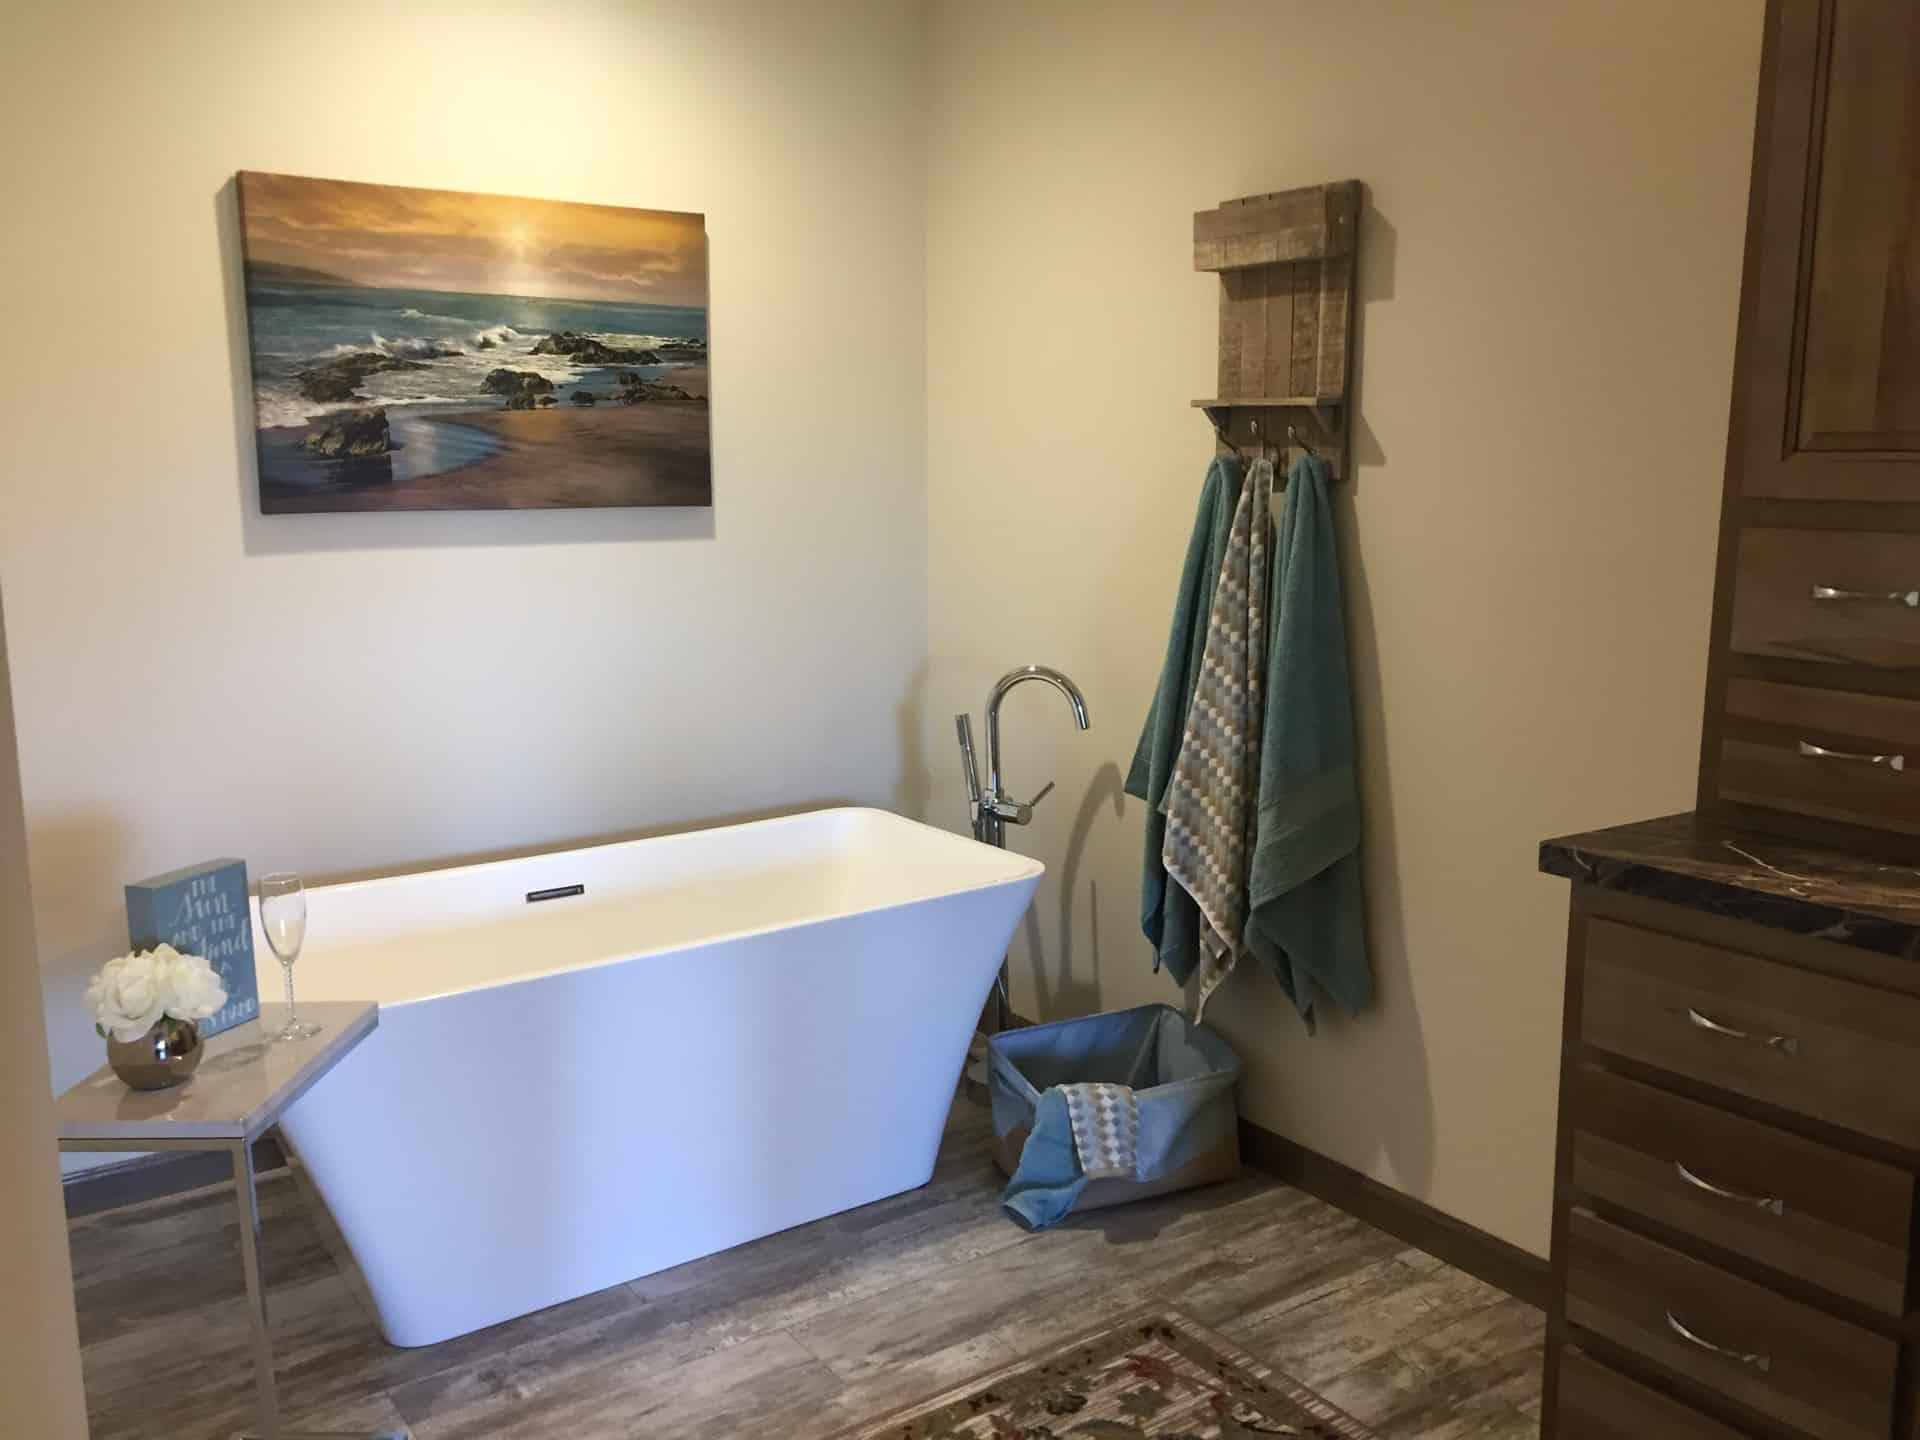 Barton master bath soaking tub - D&W Homes